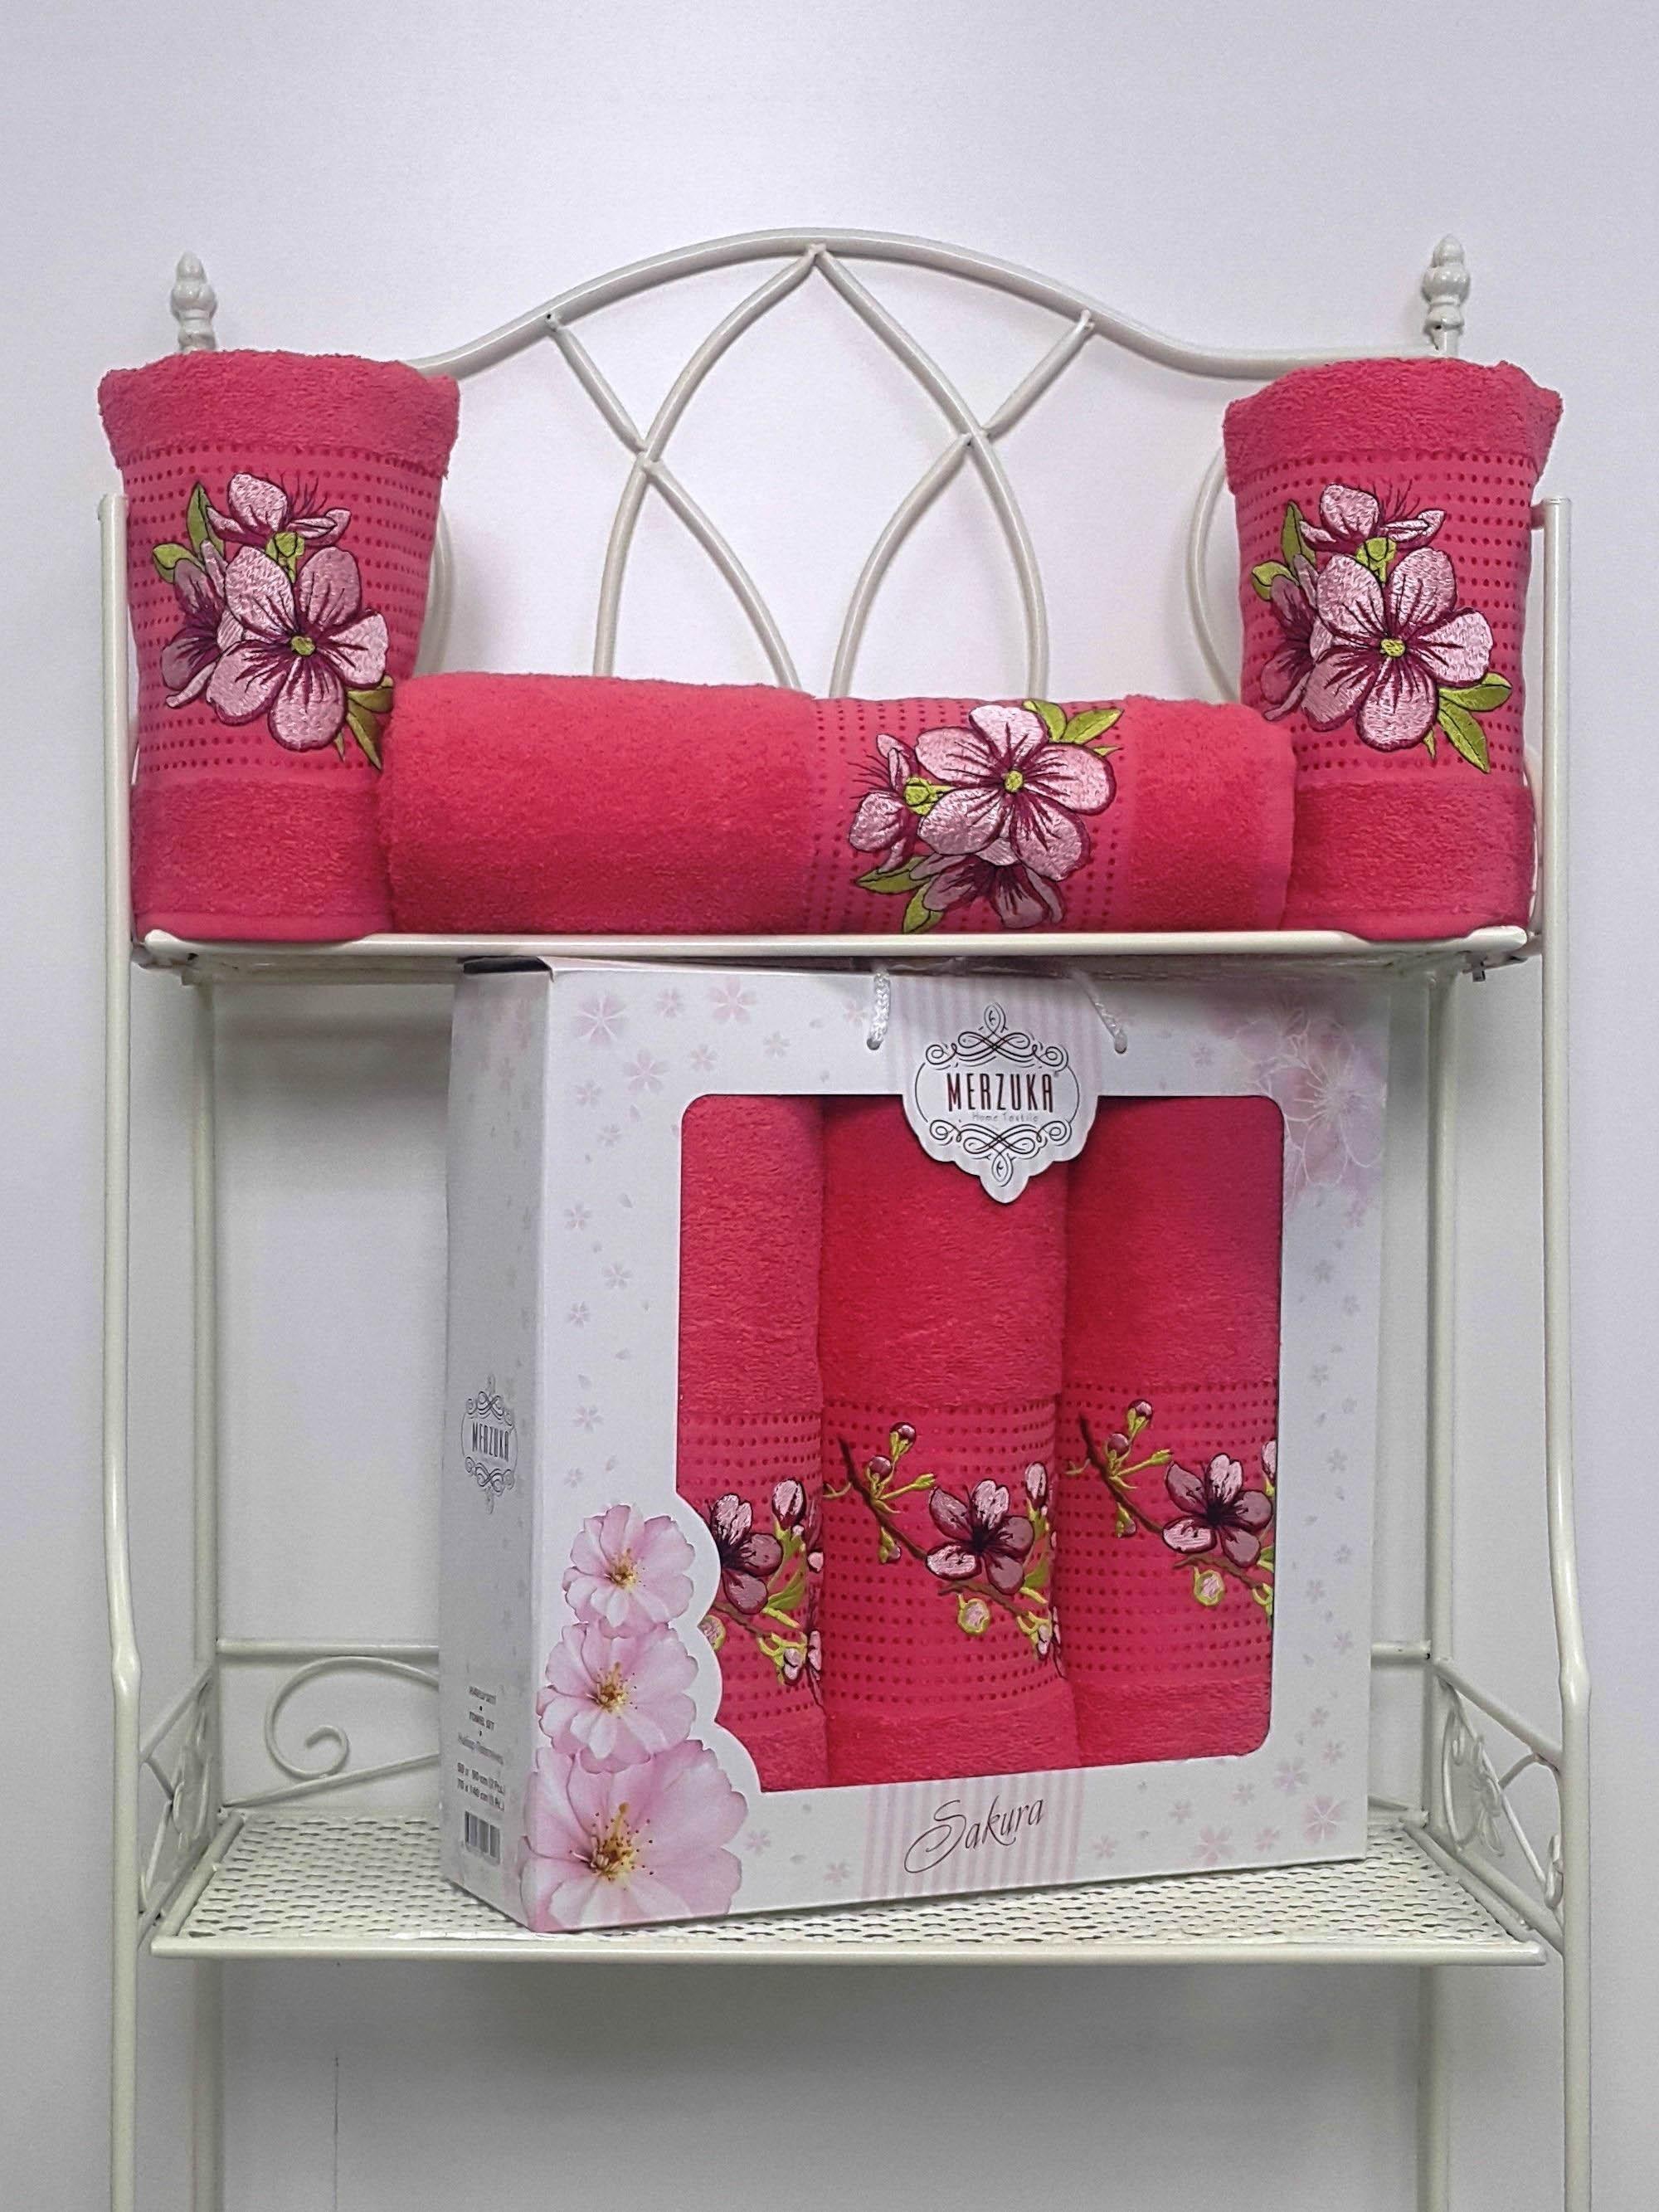 Полотенца Oran Merzuka Полотенце Sakura Цвет: Малиновый (Набор) набор из 3 полотенец merzuka sakura 50х90 2 70х140 8432 розовый